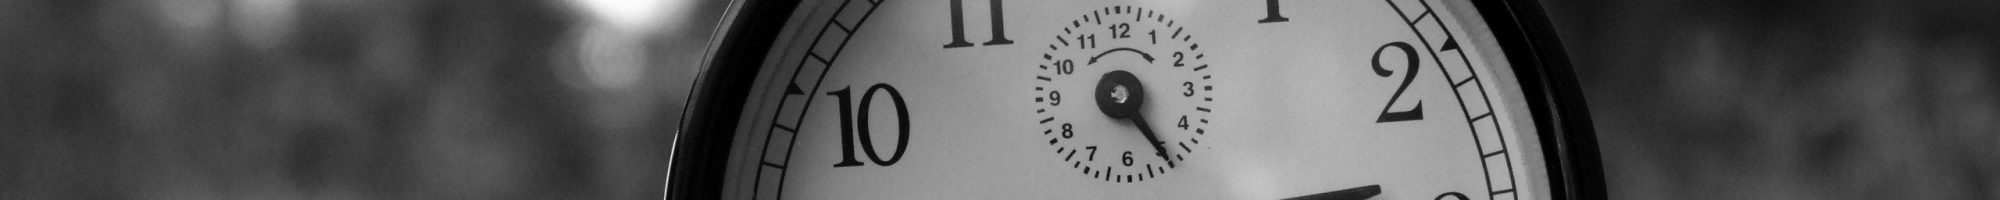 Alarm_Clock_HD_Wallpaper_Background.jpg